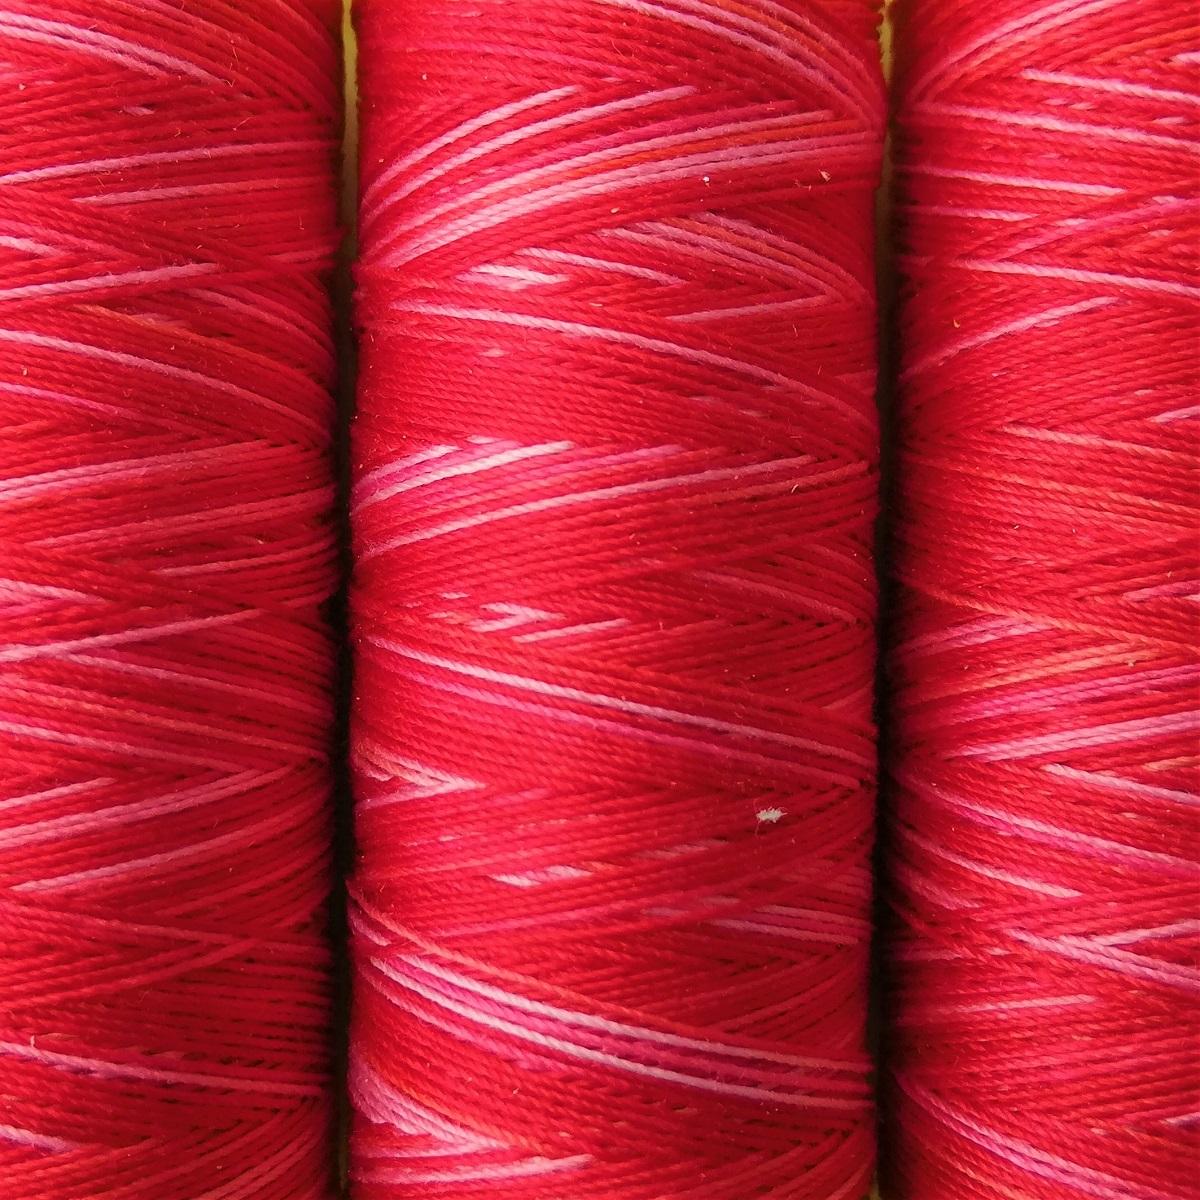 Gütermann Deco Stitch Multicolor 9984, 70m